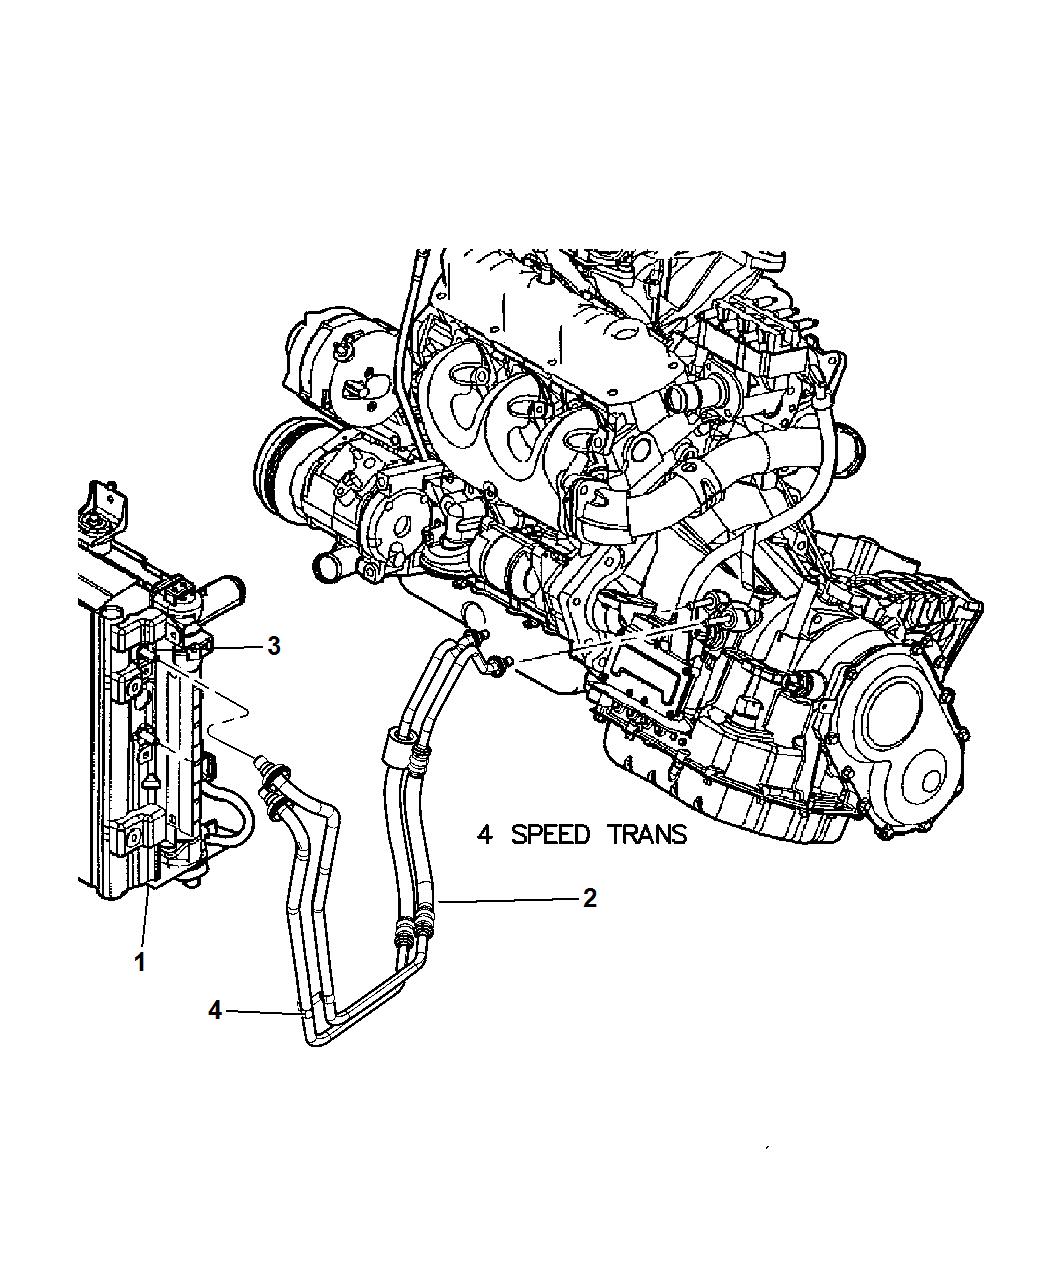 2010 Dodge Grand Caravan Engine Diagram 1968 Chevrolet Truck Wiring Diagram Begeboy Wiring Diagram Source